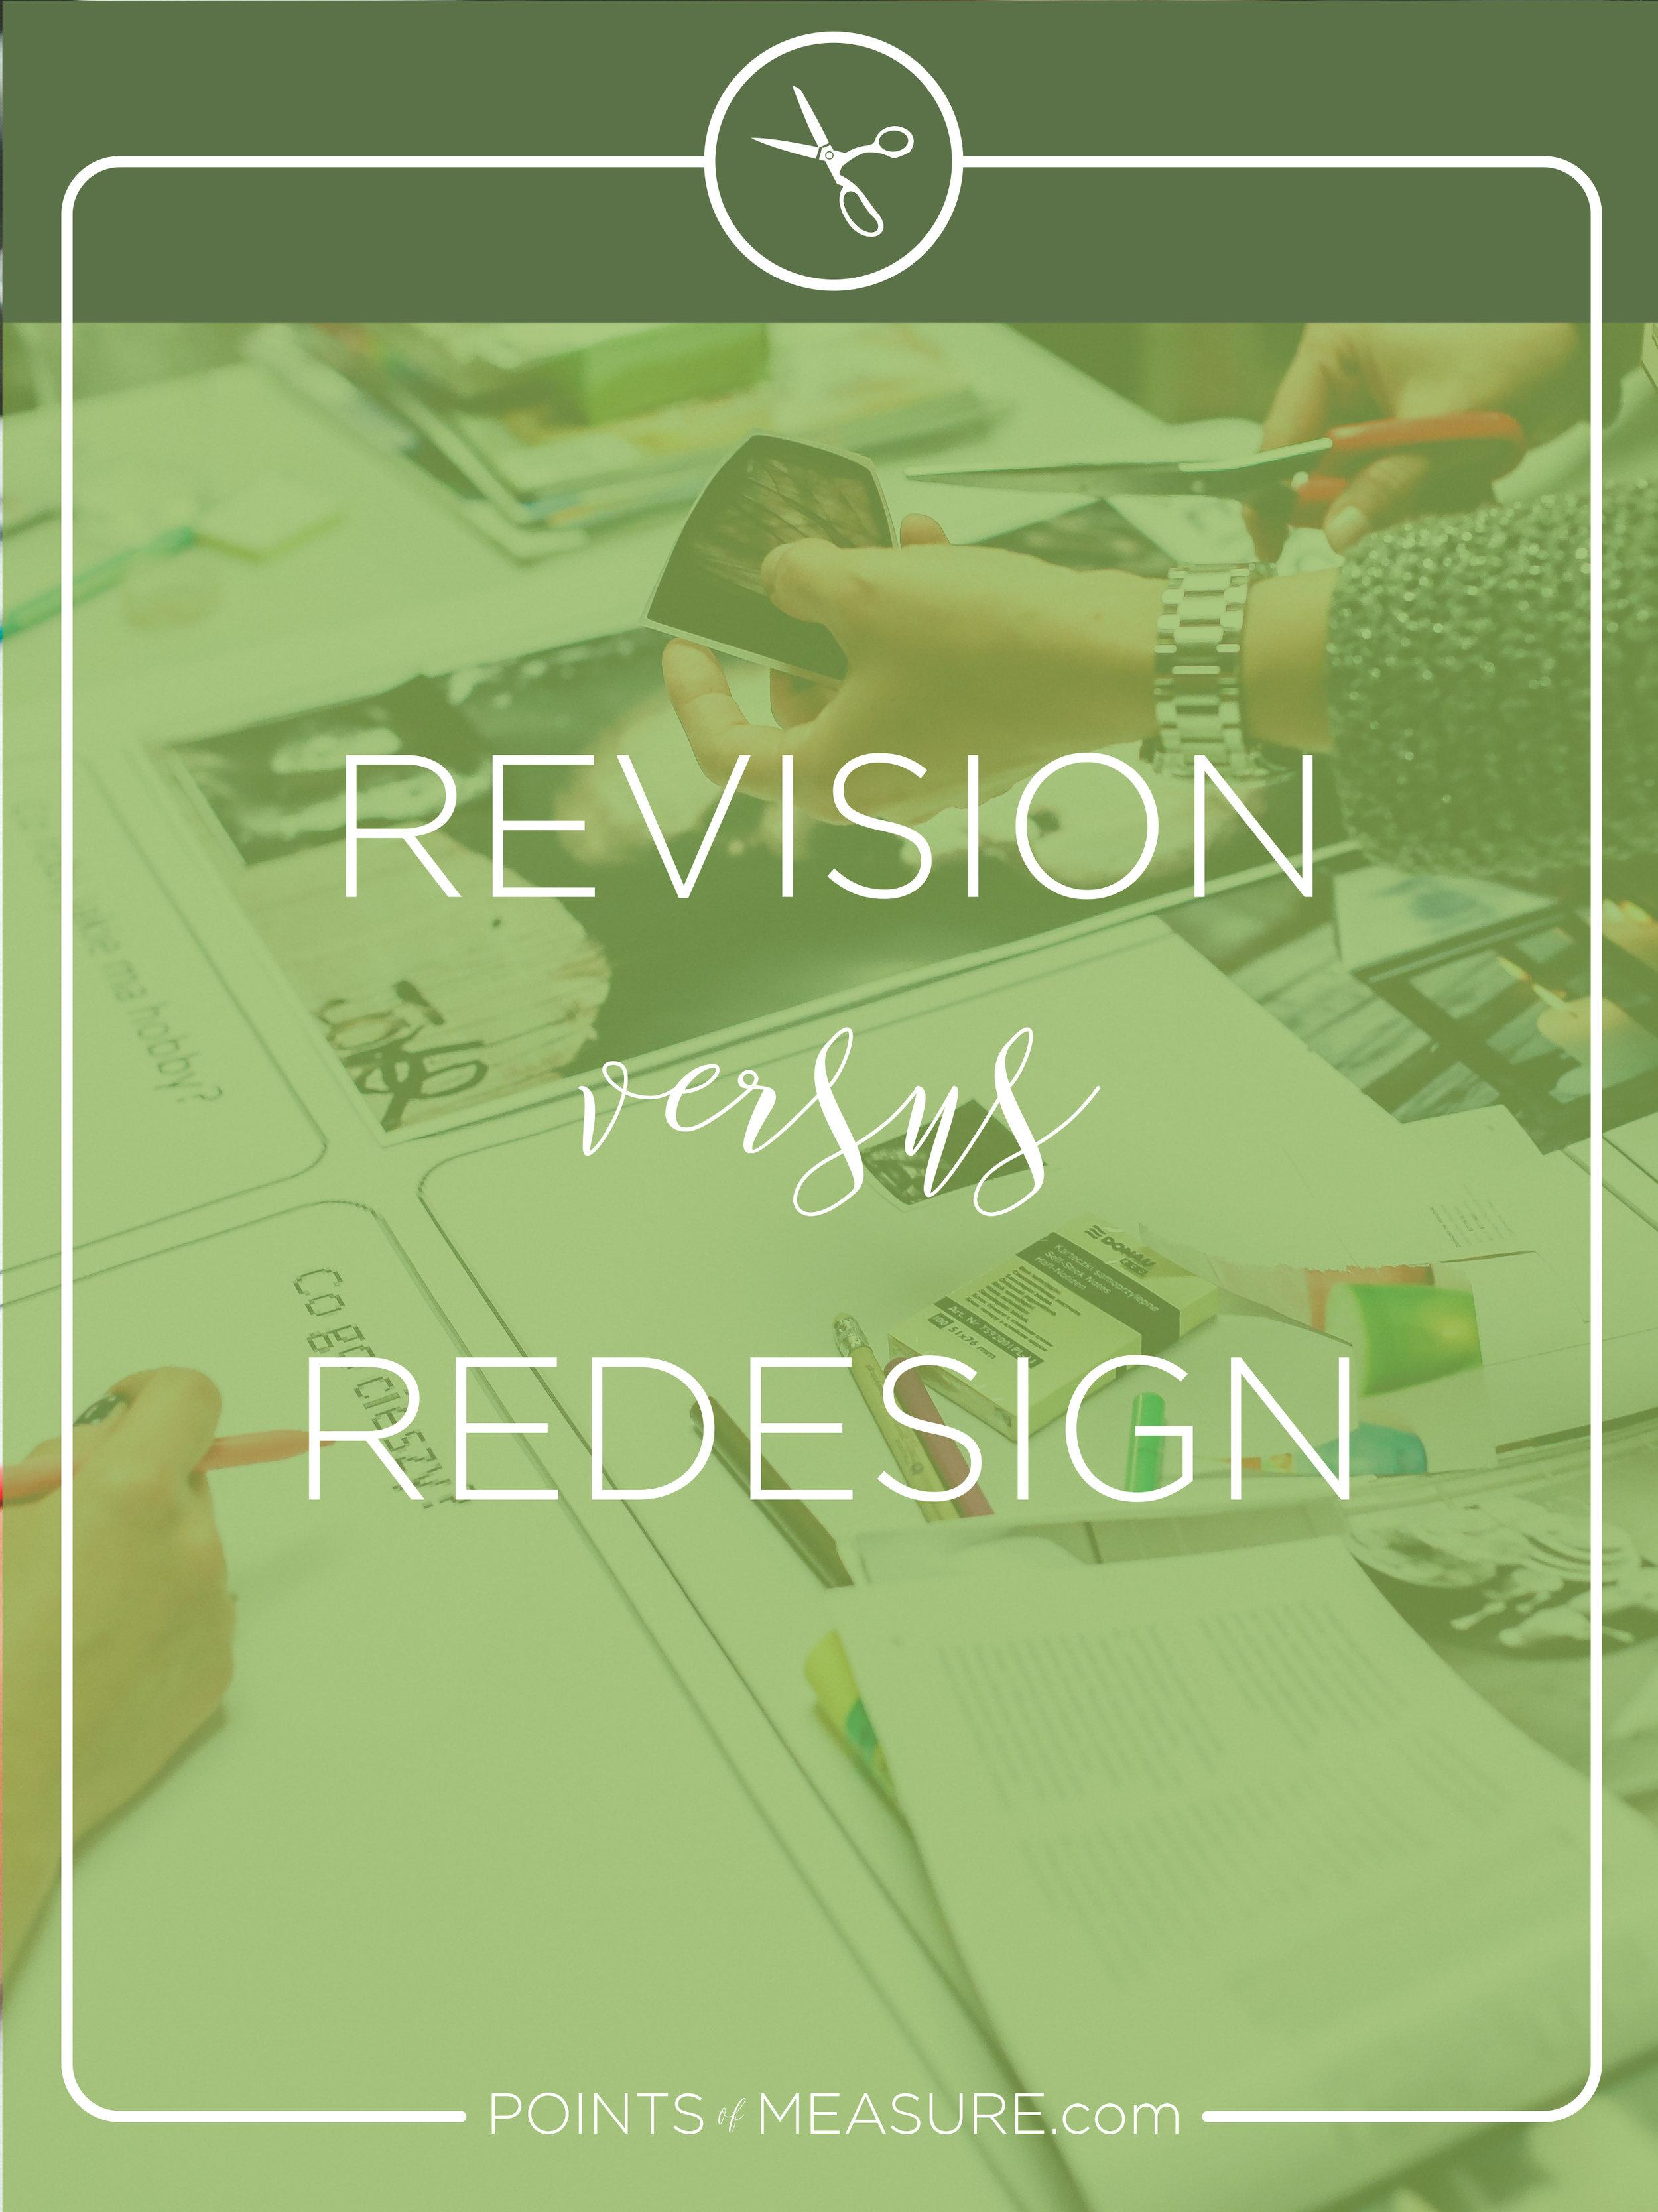 revision vs redesign.jpg